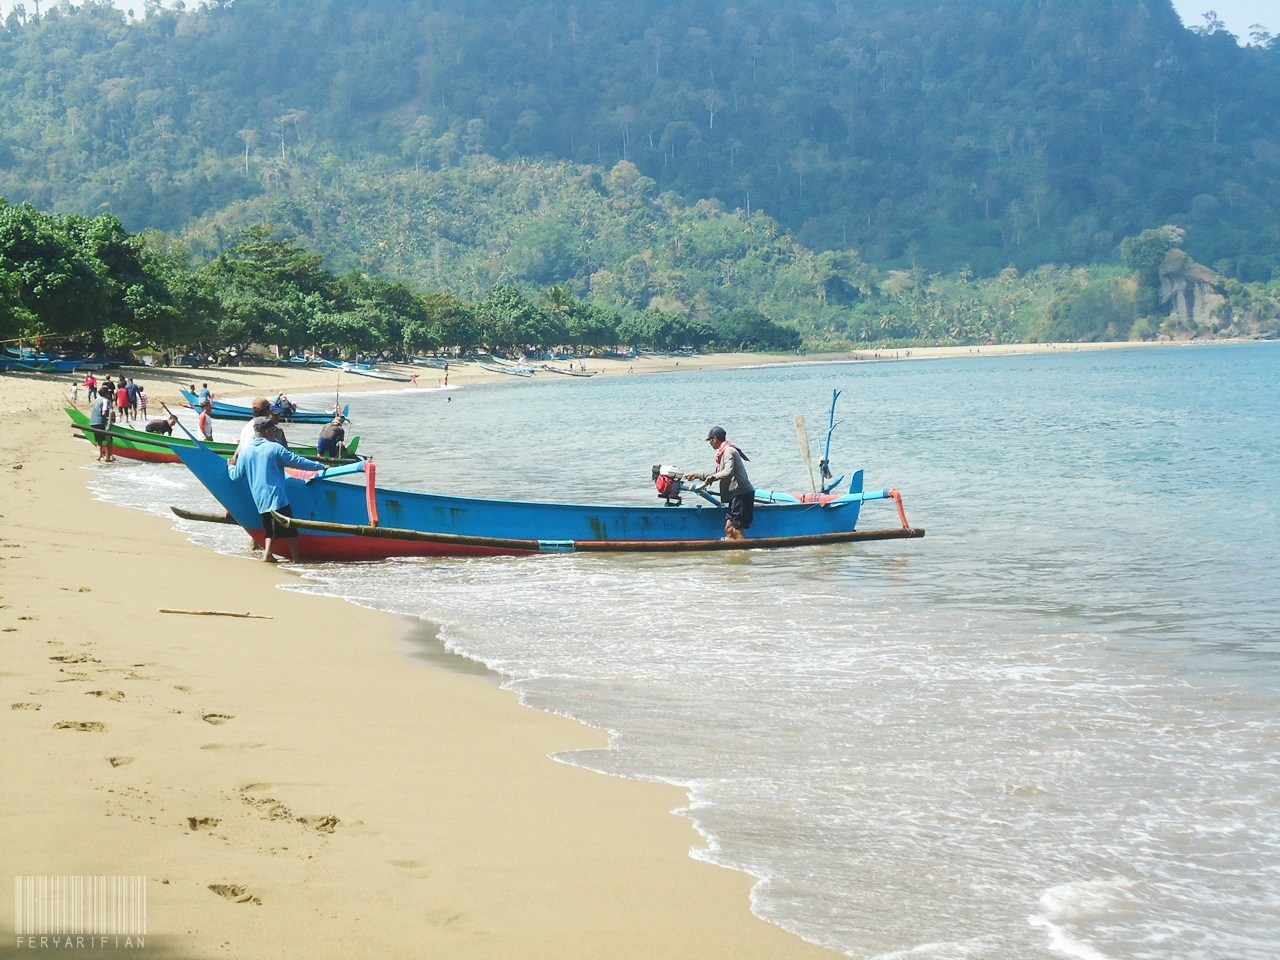 Menguak Keperawanan Pantai Sipelot Salah Satu Surga Malang Http 2